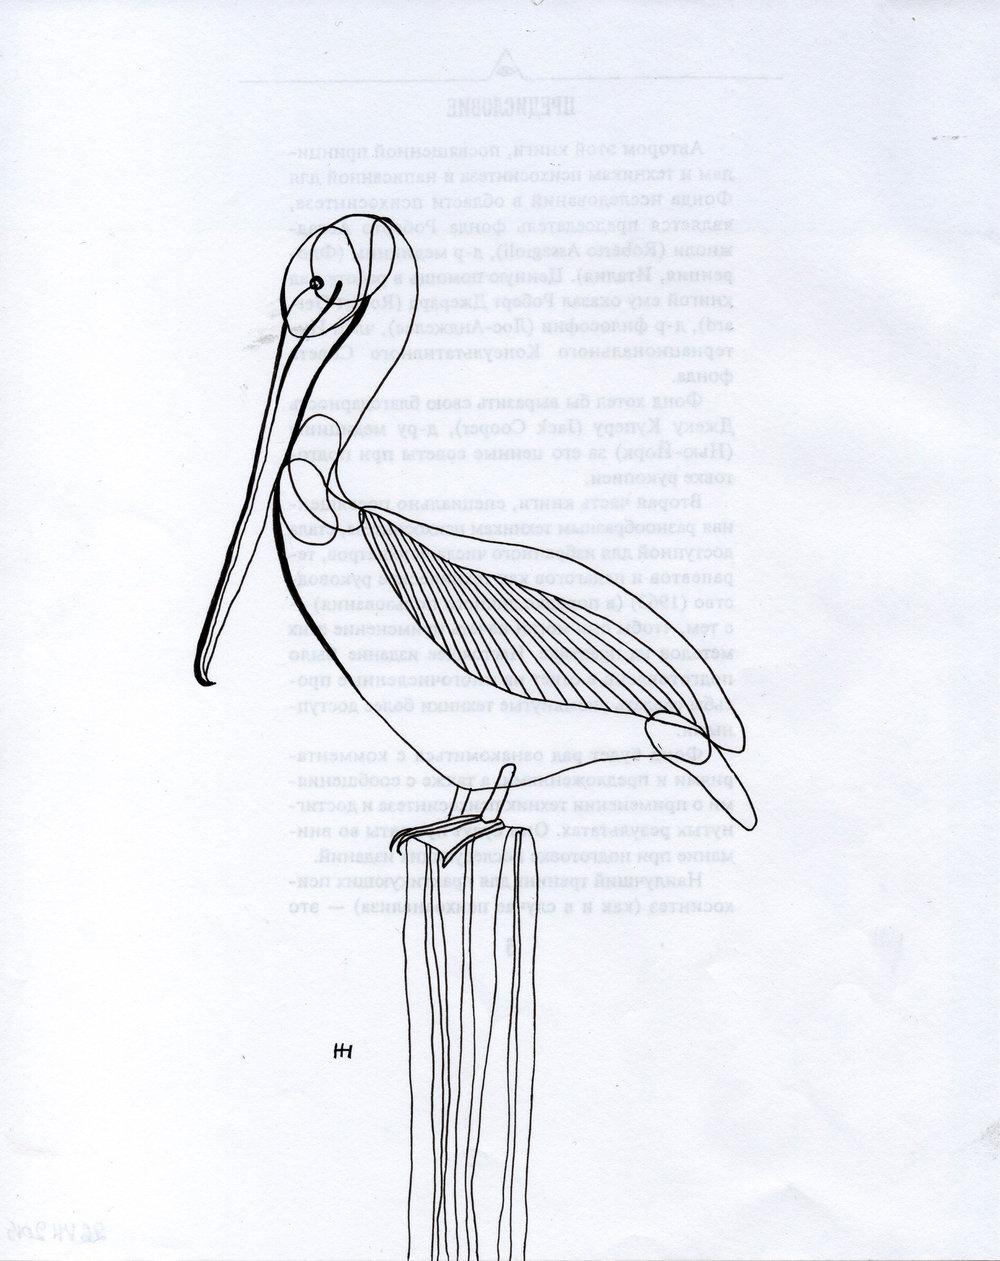 PticyLinejnye_0 30.jpg